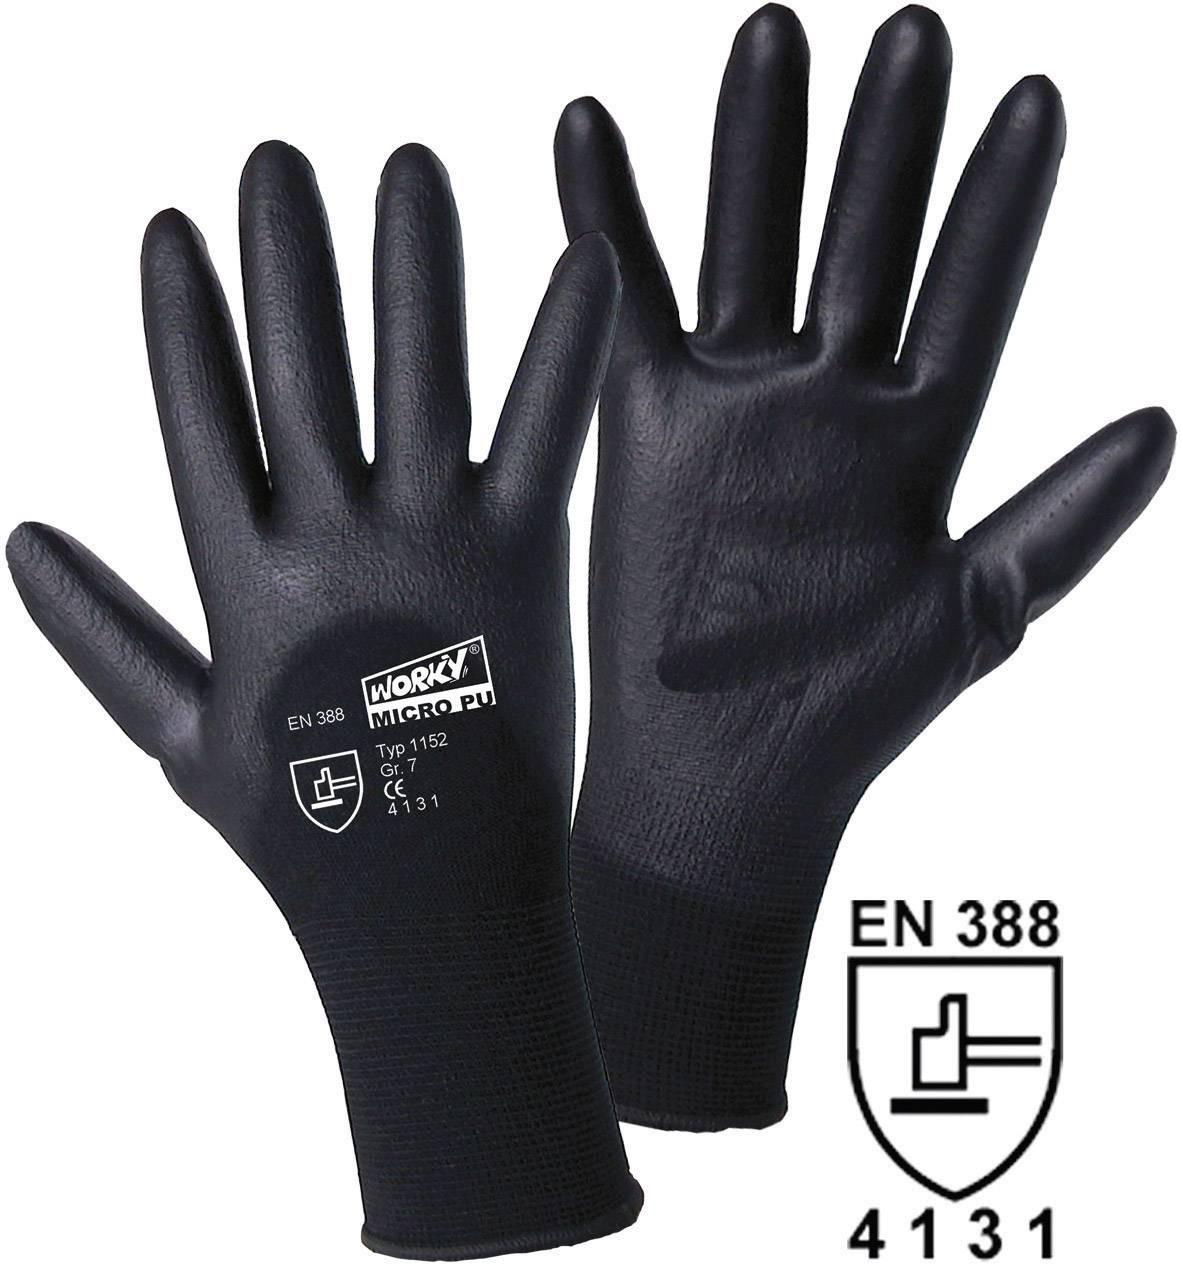 Pracovné rukavice L+D worky MICRO black 1152, velikost rukavic: 9, L